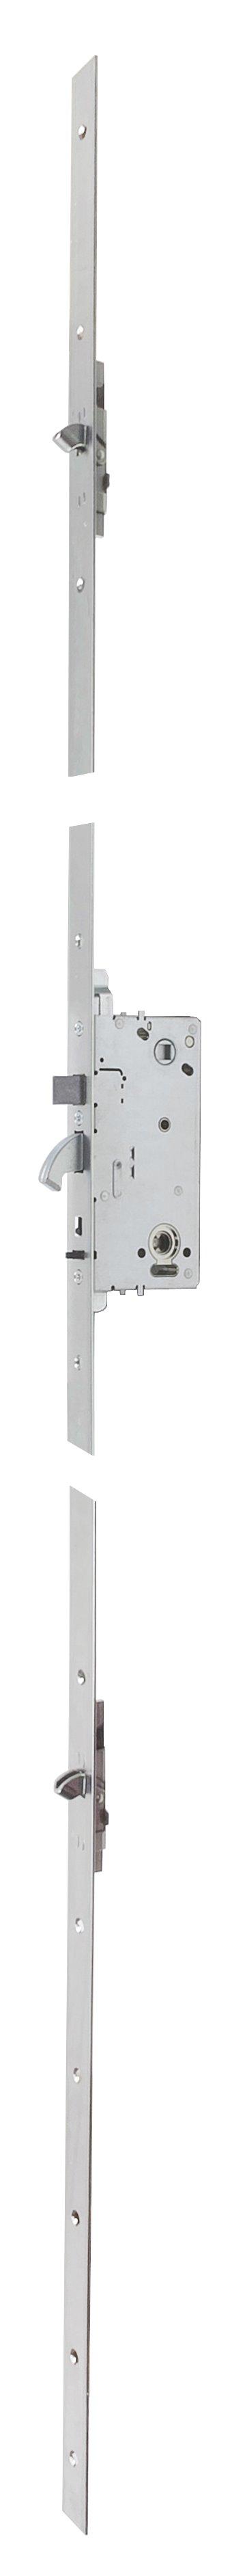 Yale Doorman MPL låsekasser